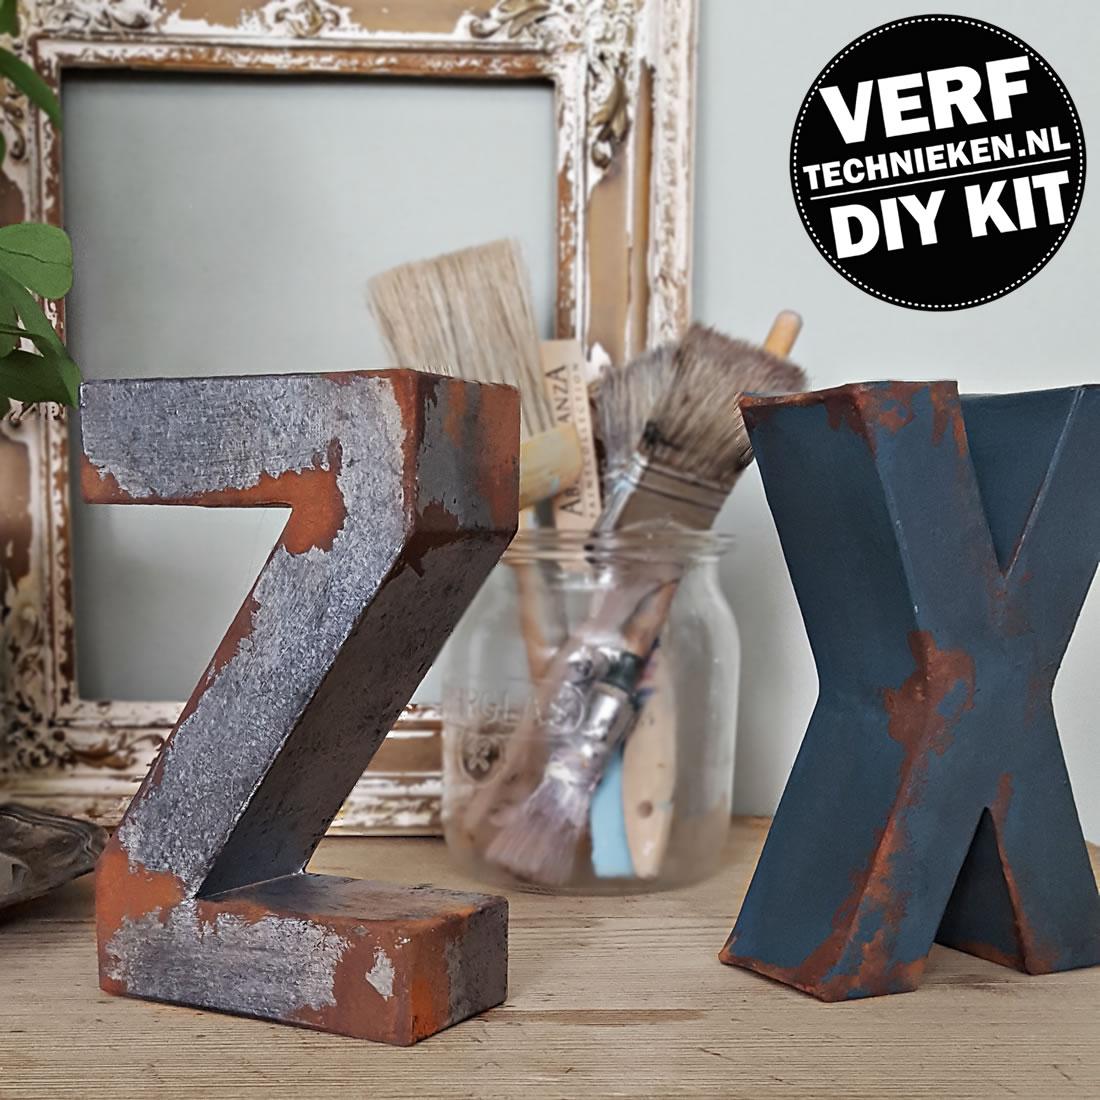 DIY Pakket Vintage Letters - verftechnieken.nl